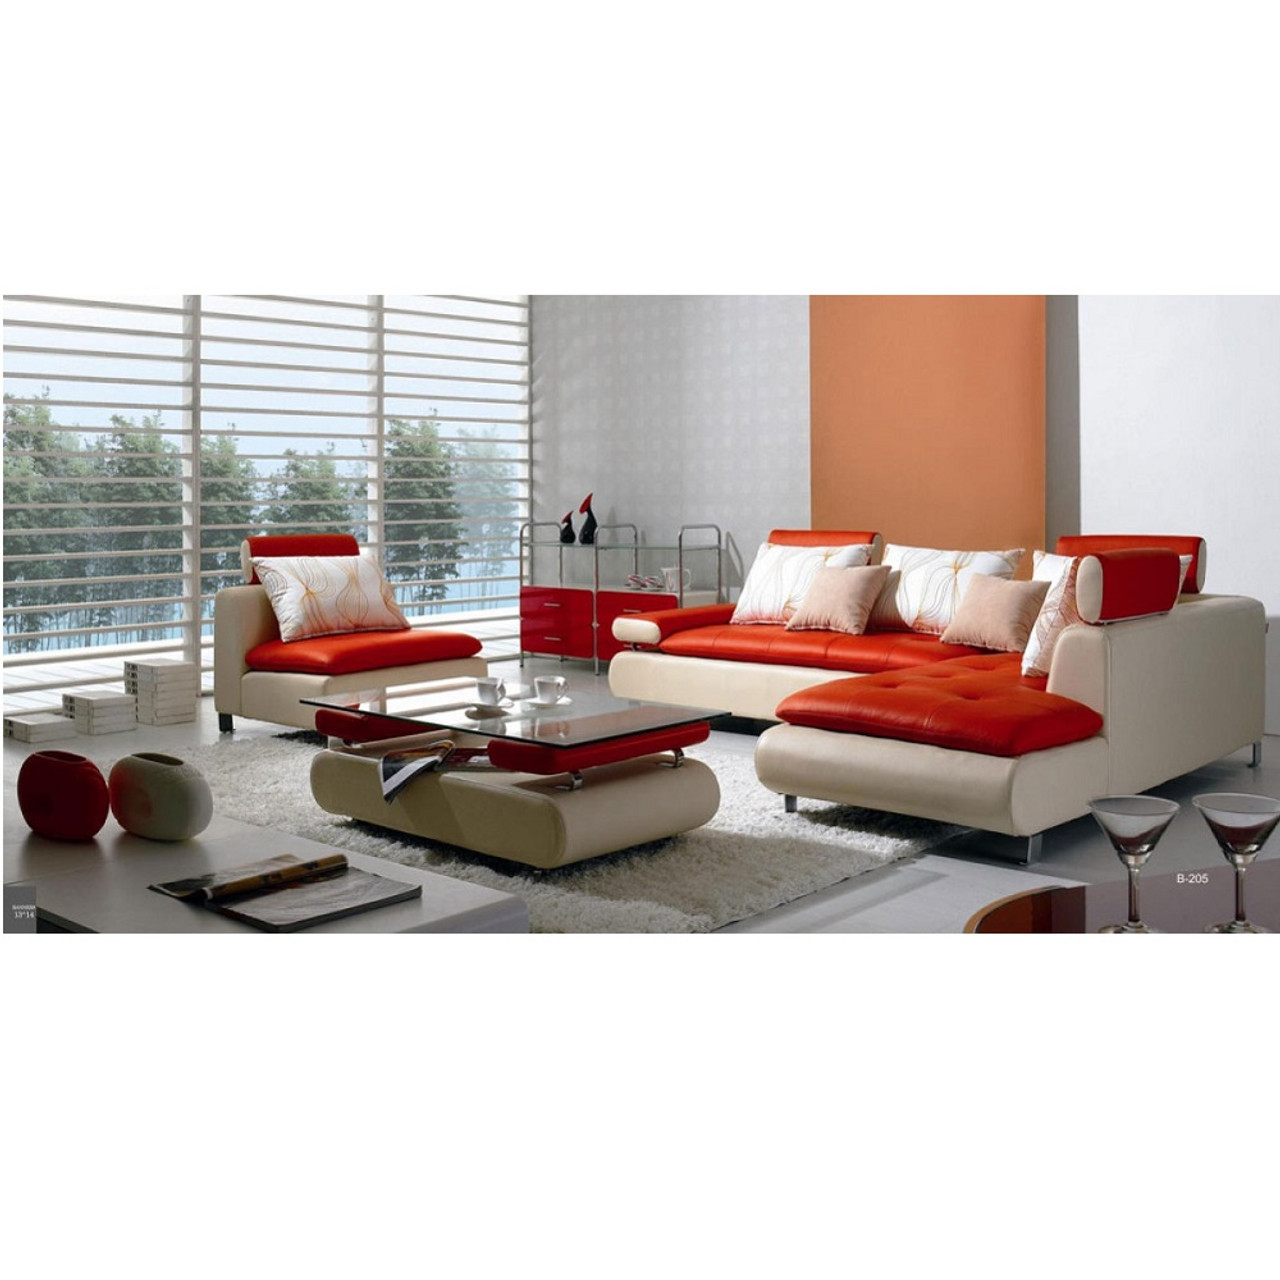 Divani Casa B205 - Modern White & Red Leather Sectional Sofa Set ...